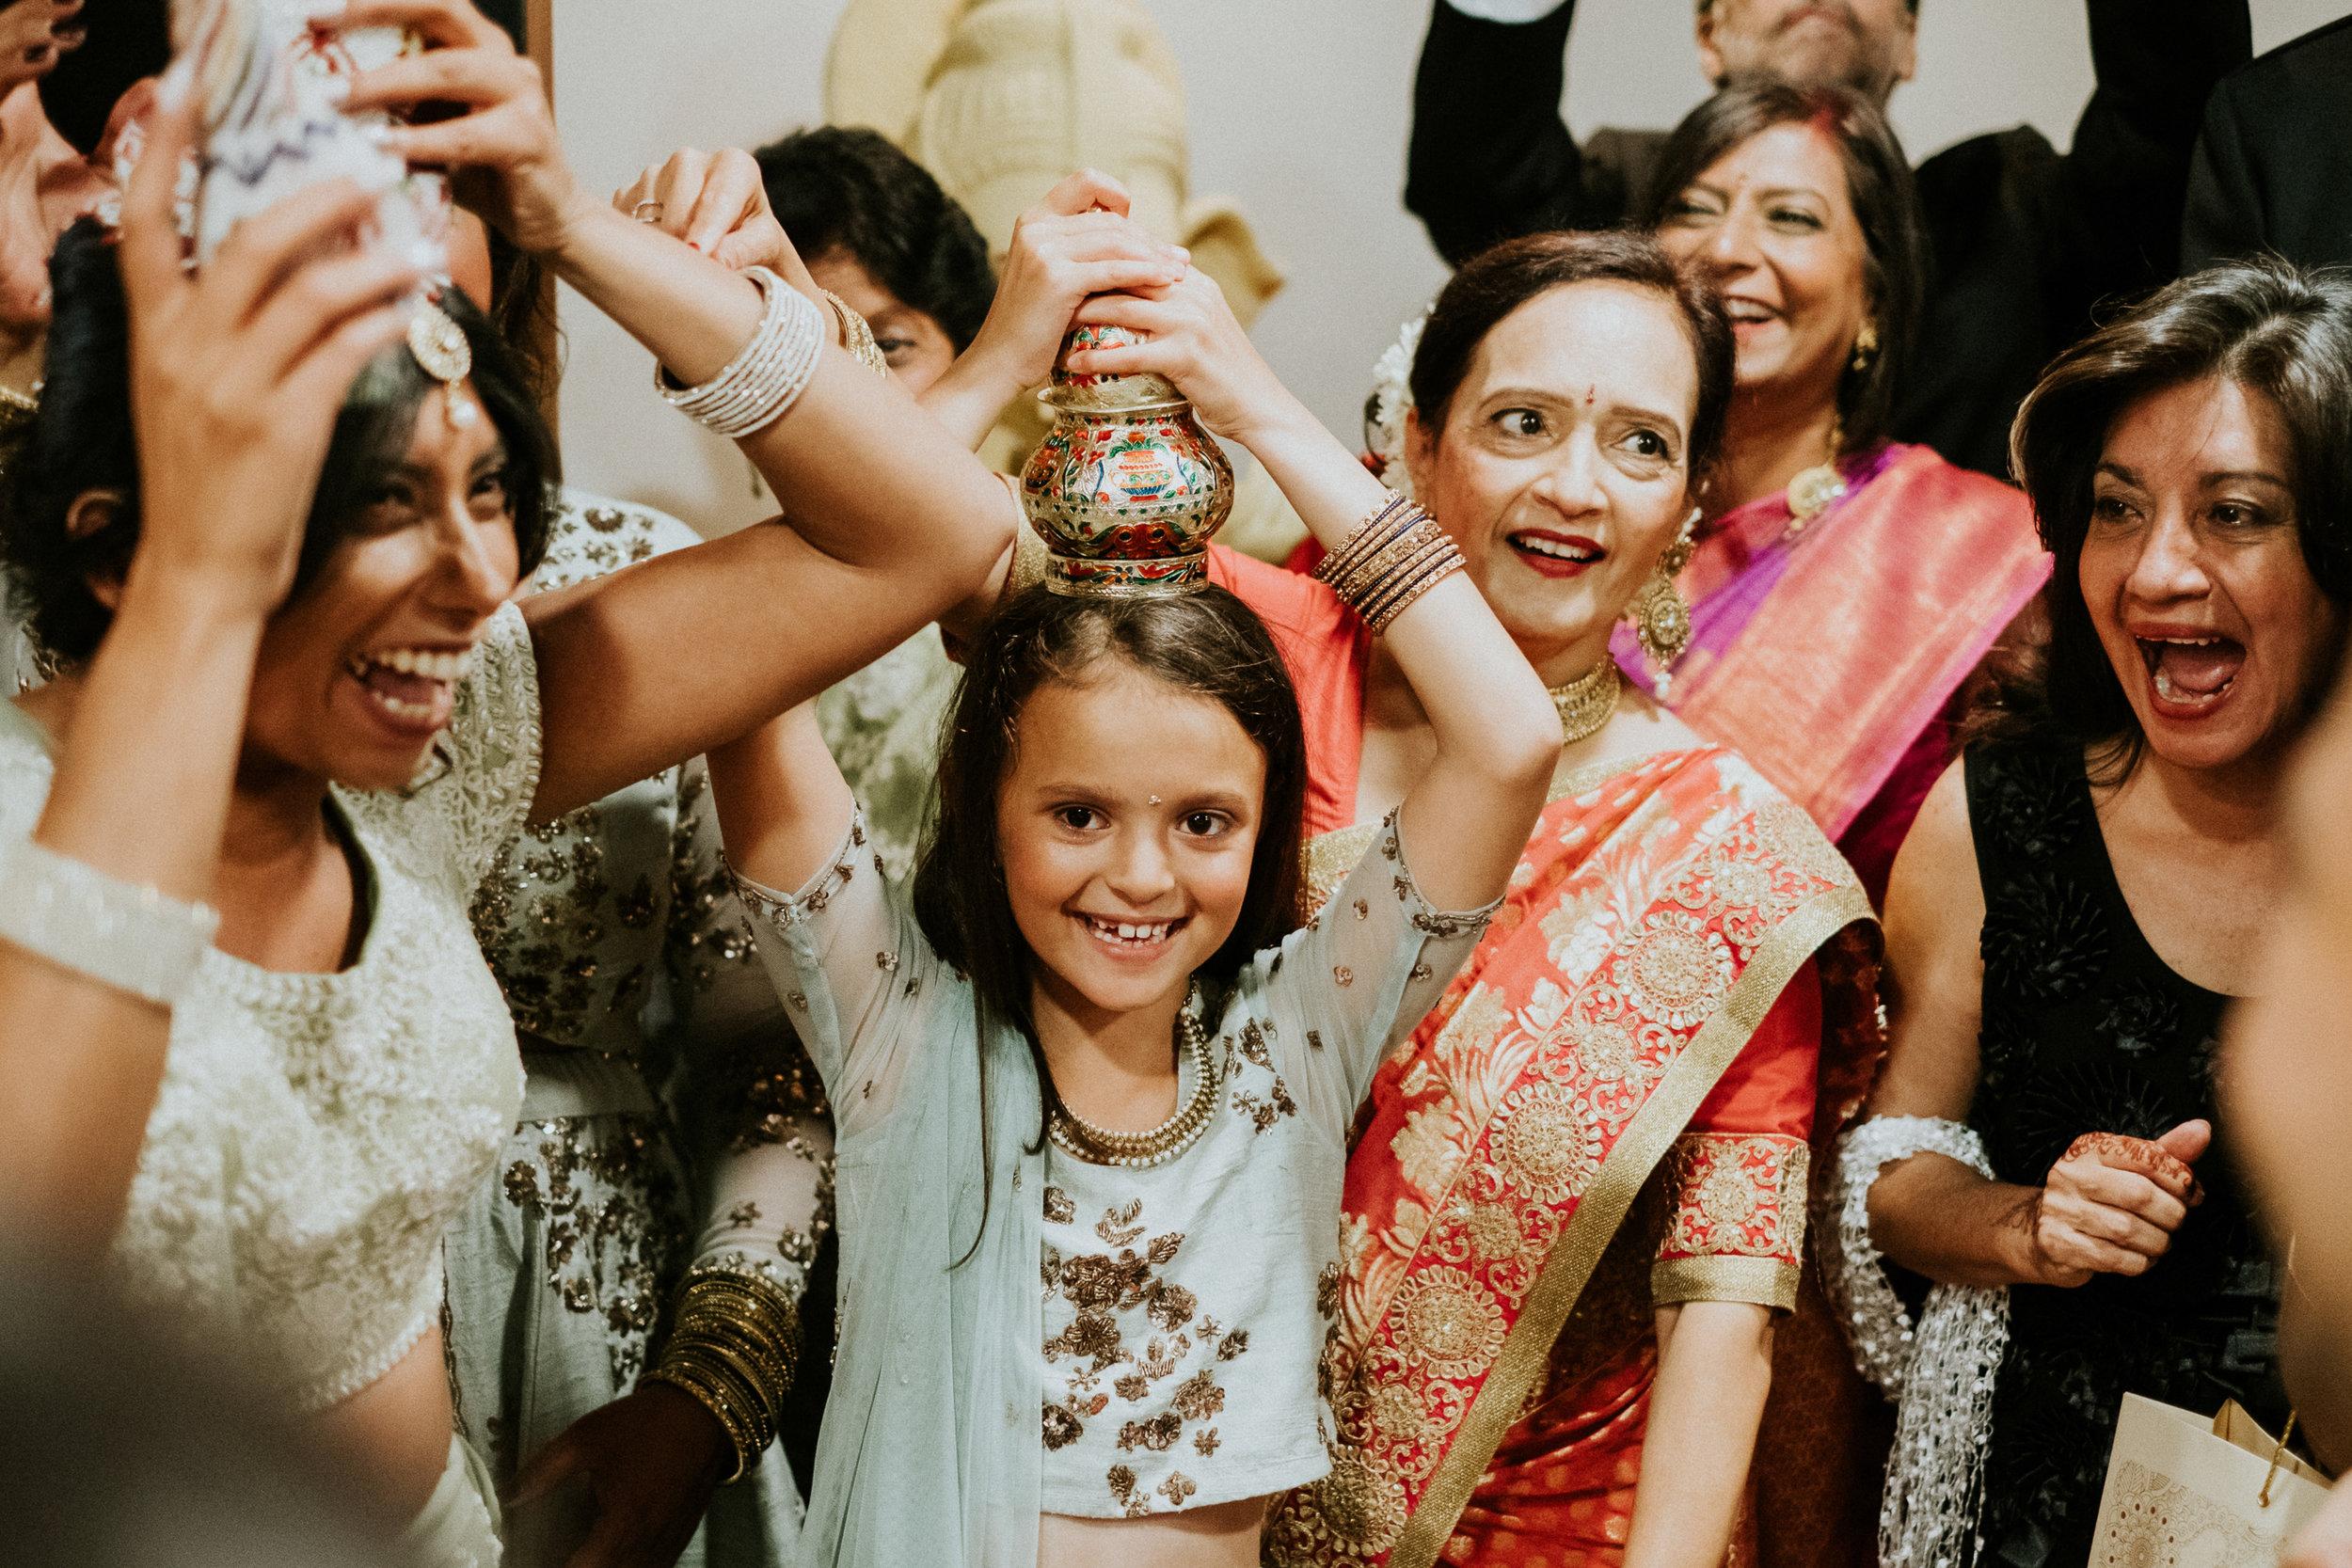 52 Indian fusion wedding alternative joanna nicole photography1.jpg